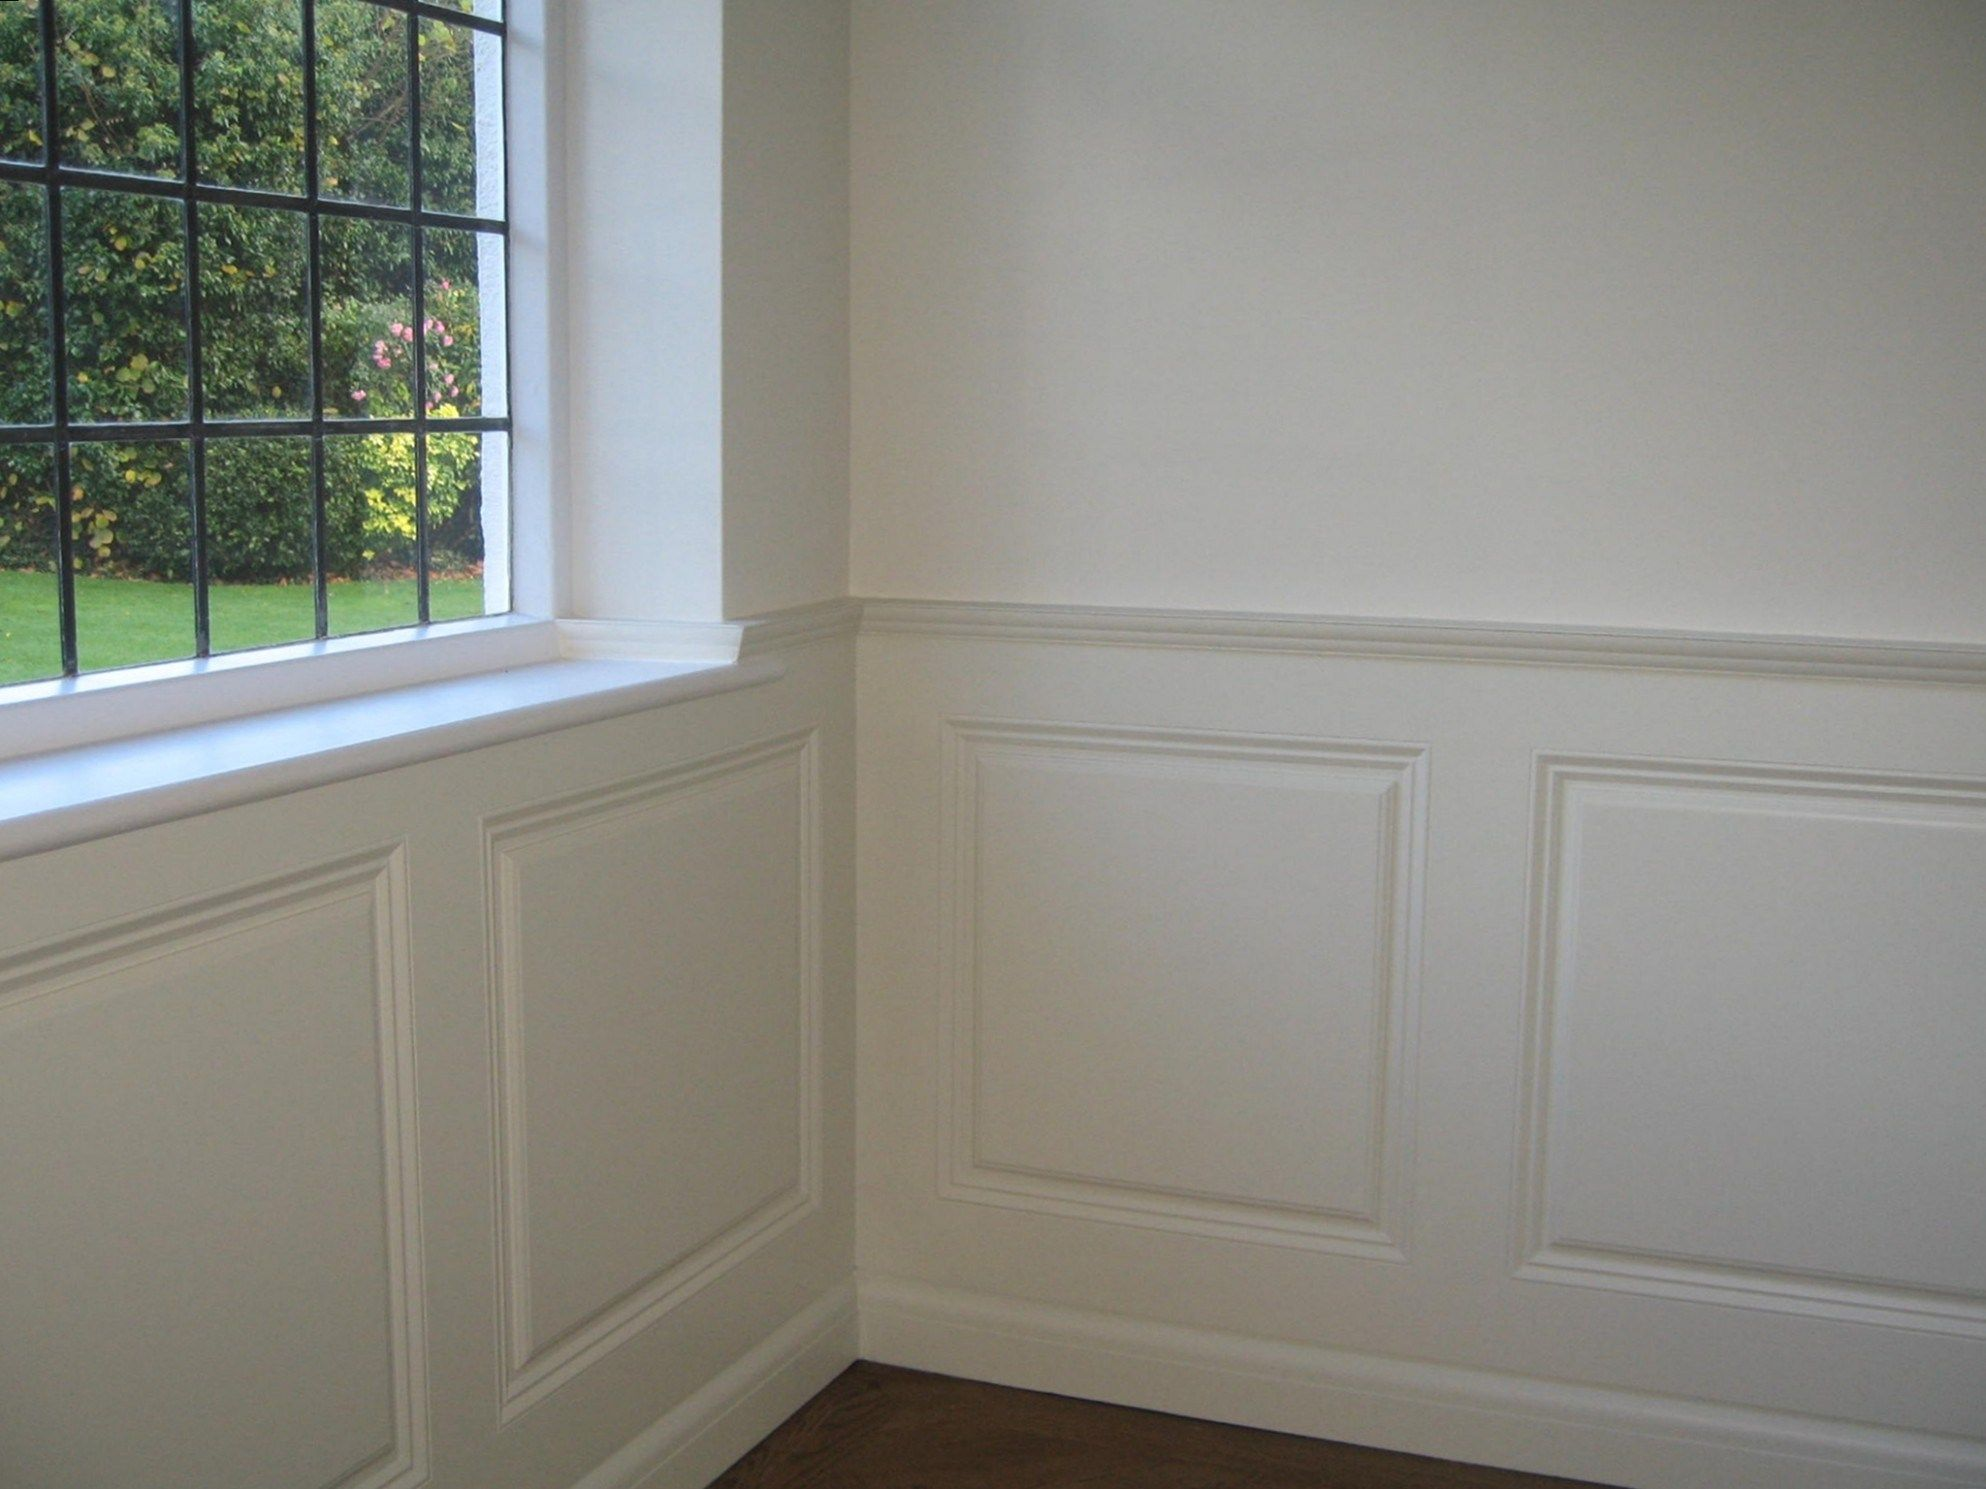 12 Bathroom Wall Panels B And Q In 2020 Weisse Wandverkleidung Holzvertafelung Wand Wandverkleidung